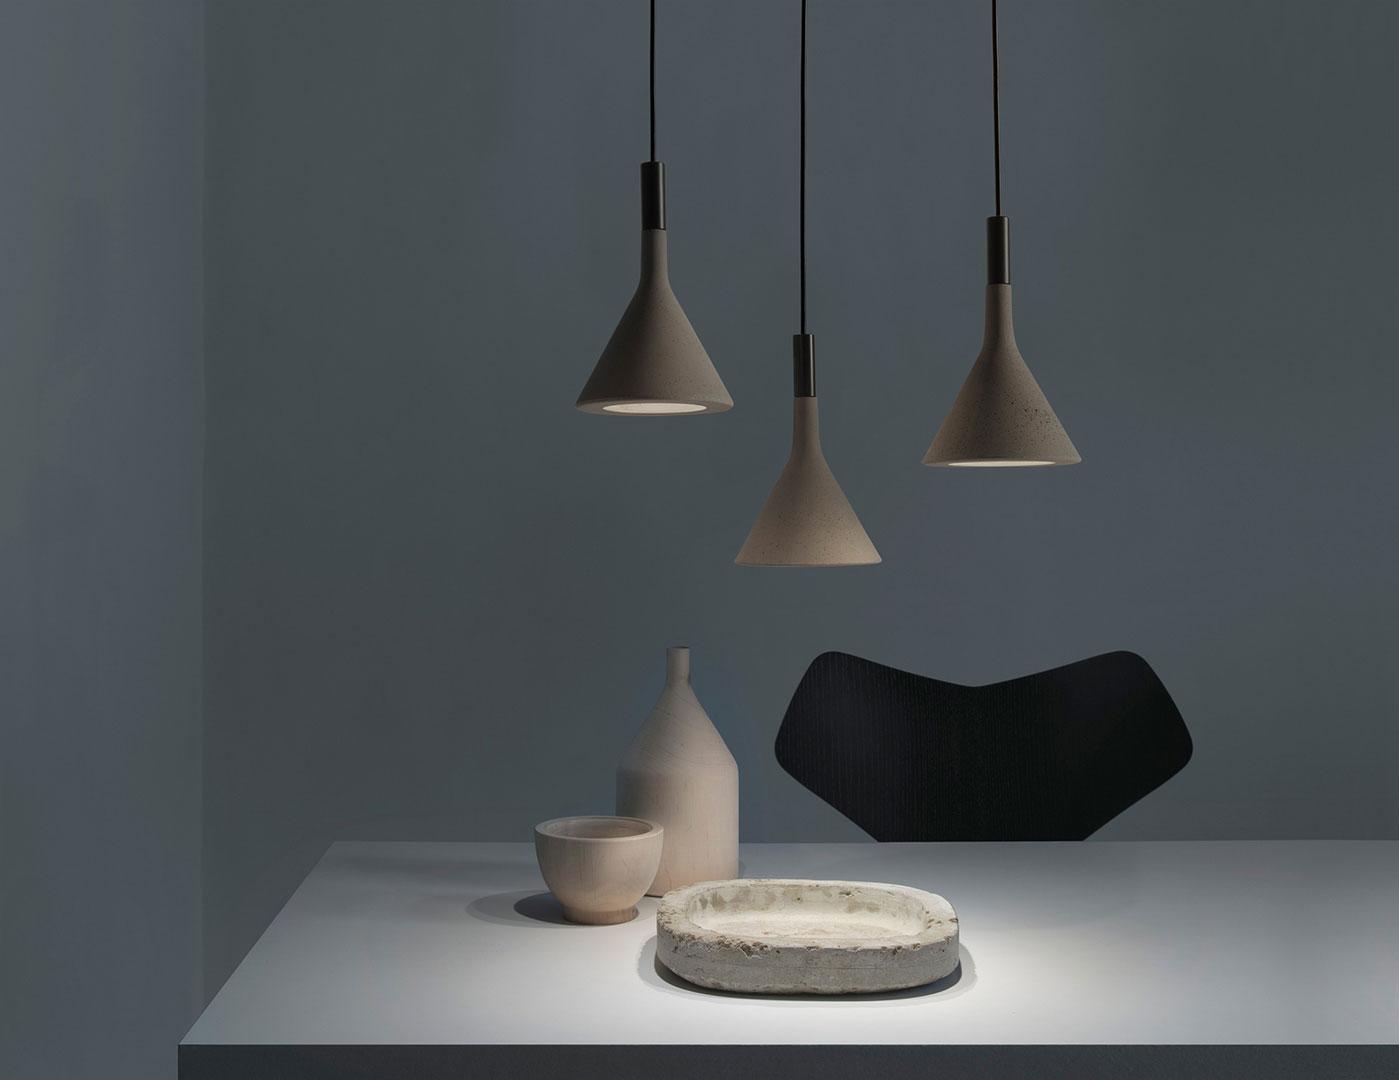 Lampade A Sospensione Foscarini : Aplomb suspension lamps design by foscarini foscarini